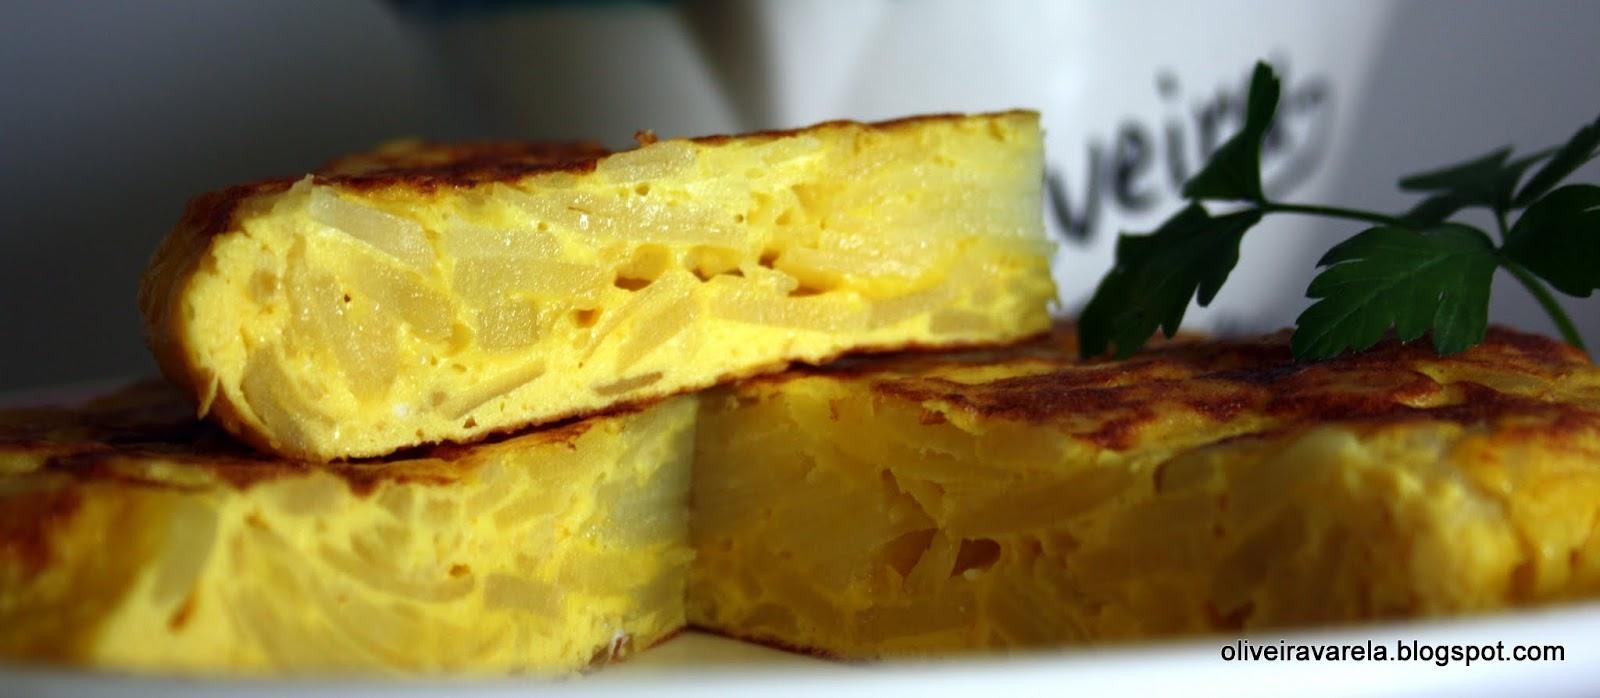 Tortilla de patatas expr s - Tortilla en el microondas ...